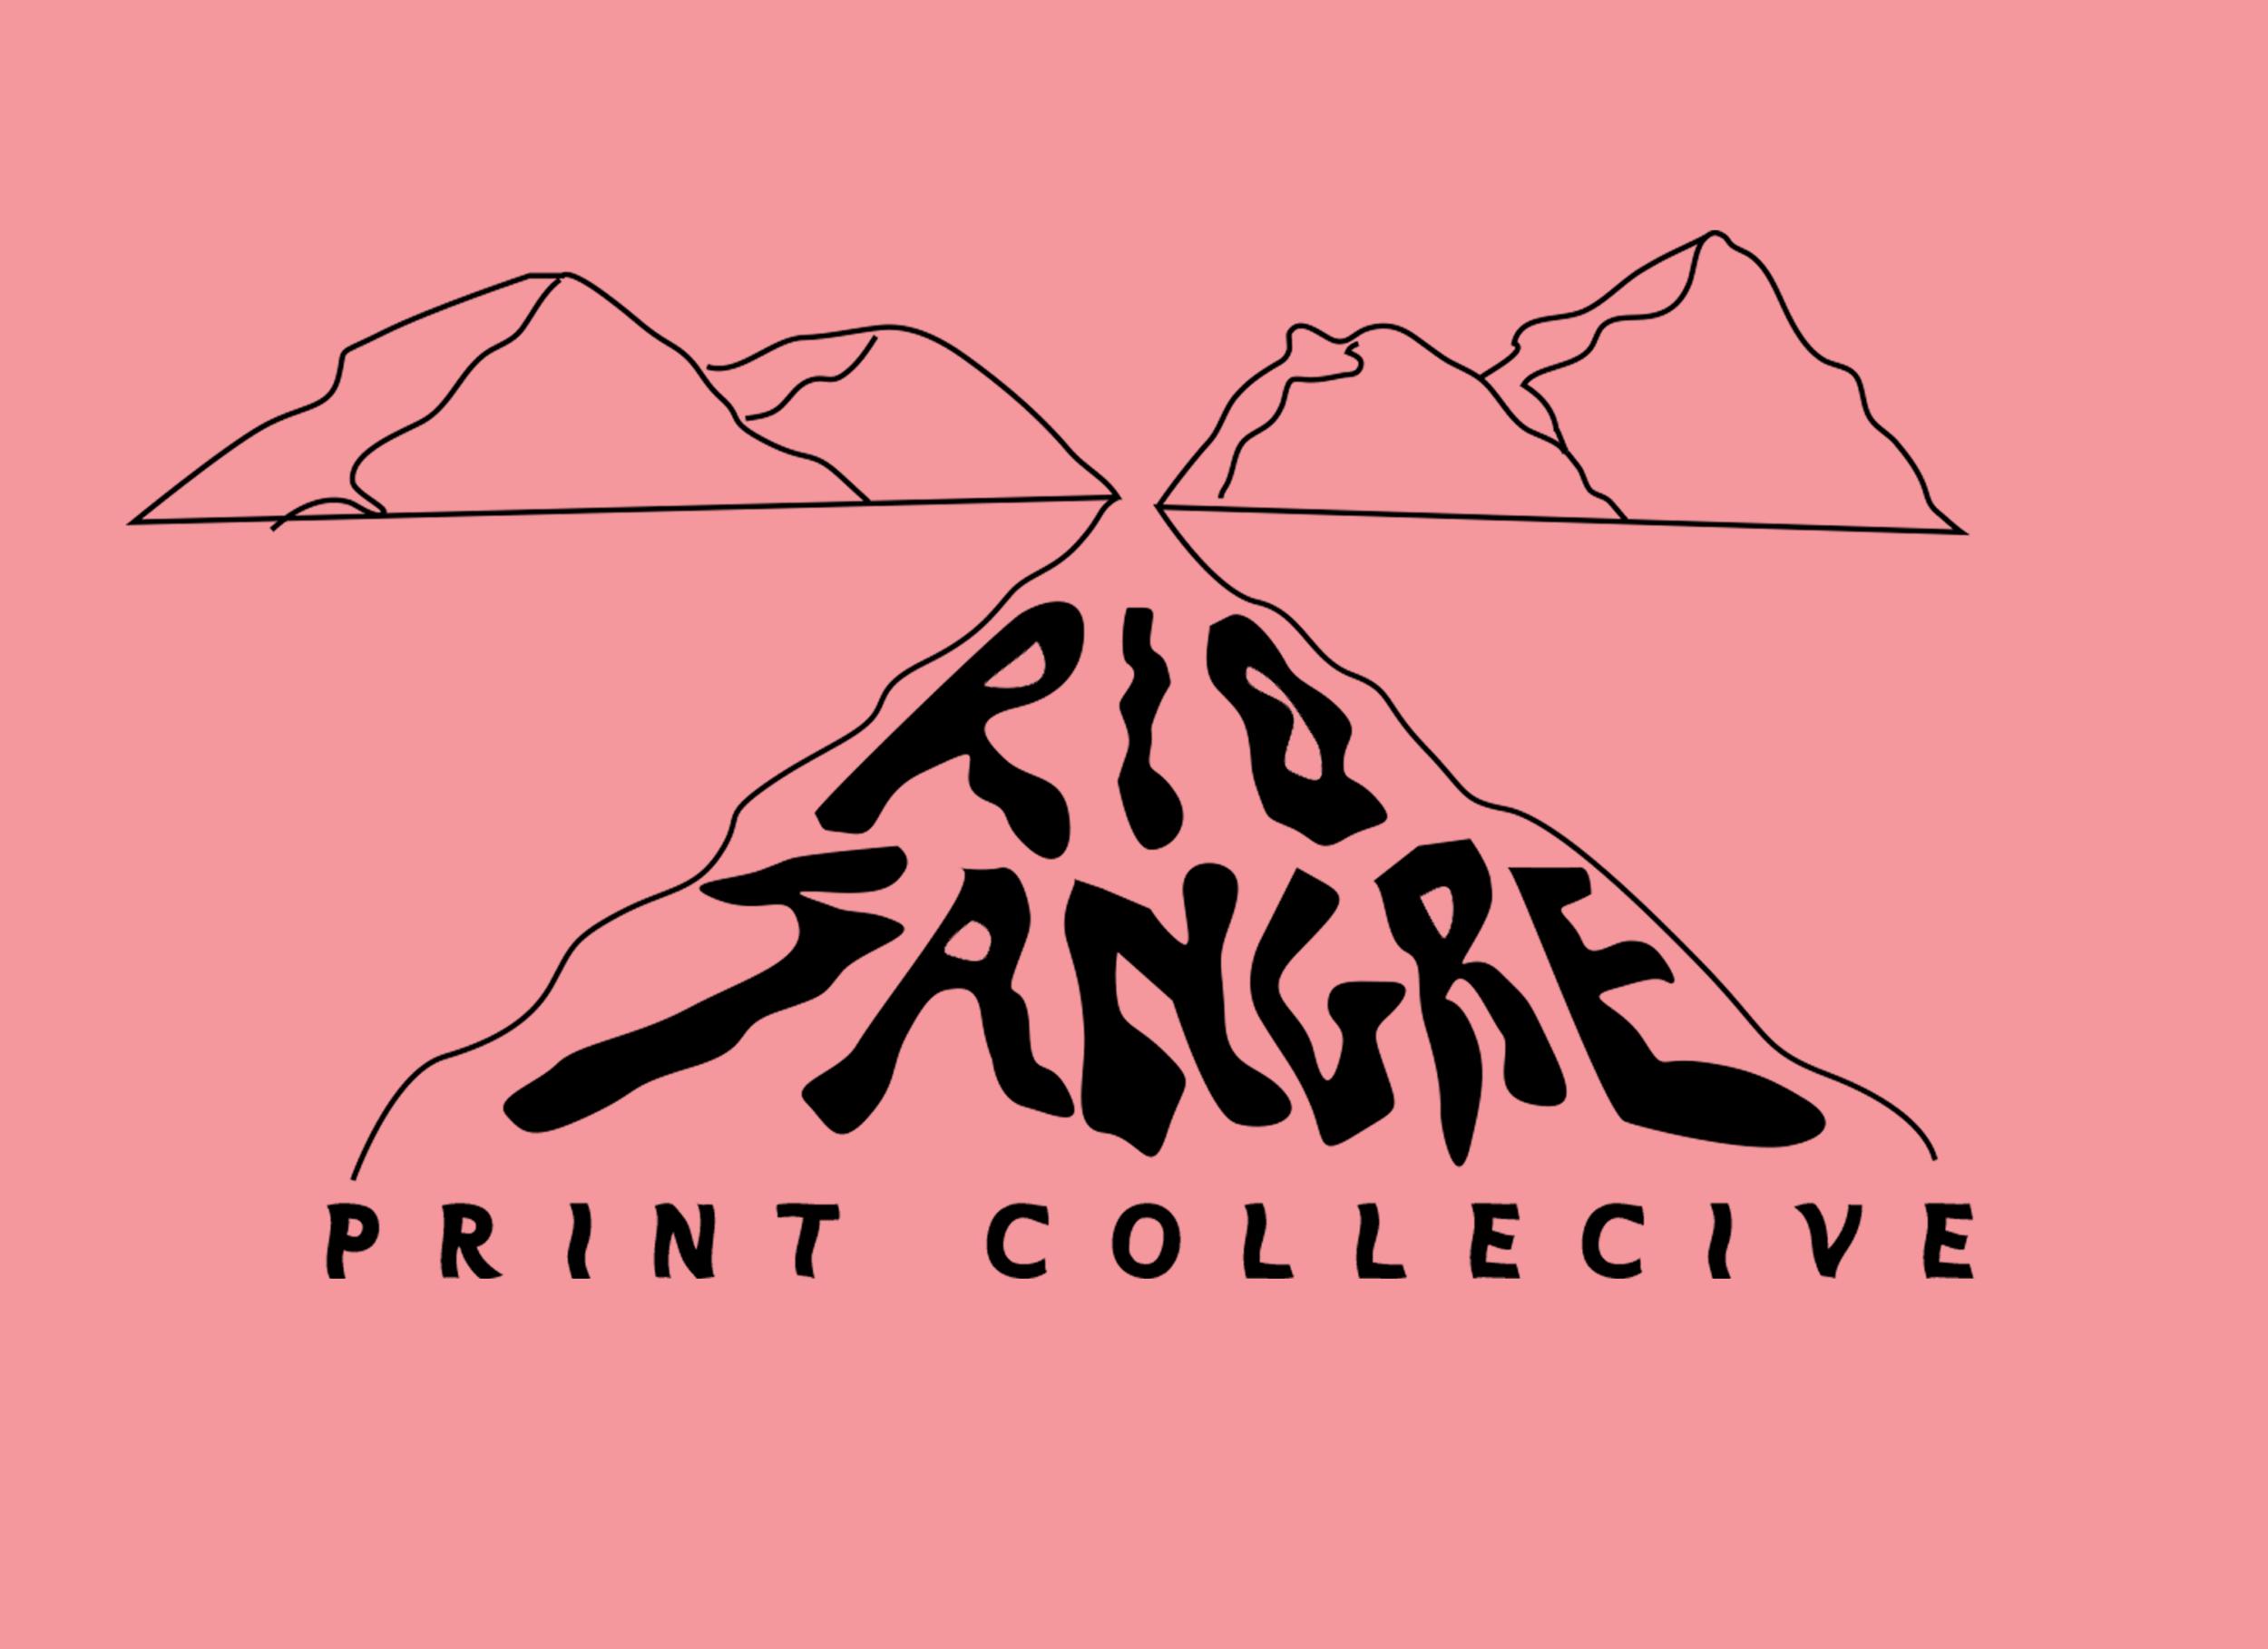 Rio Sangre Print Collective - Las Cruces, NM